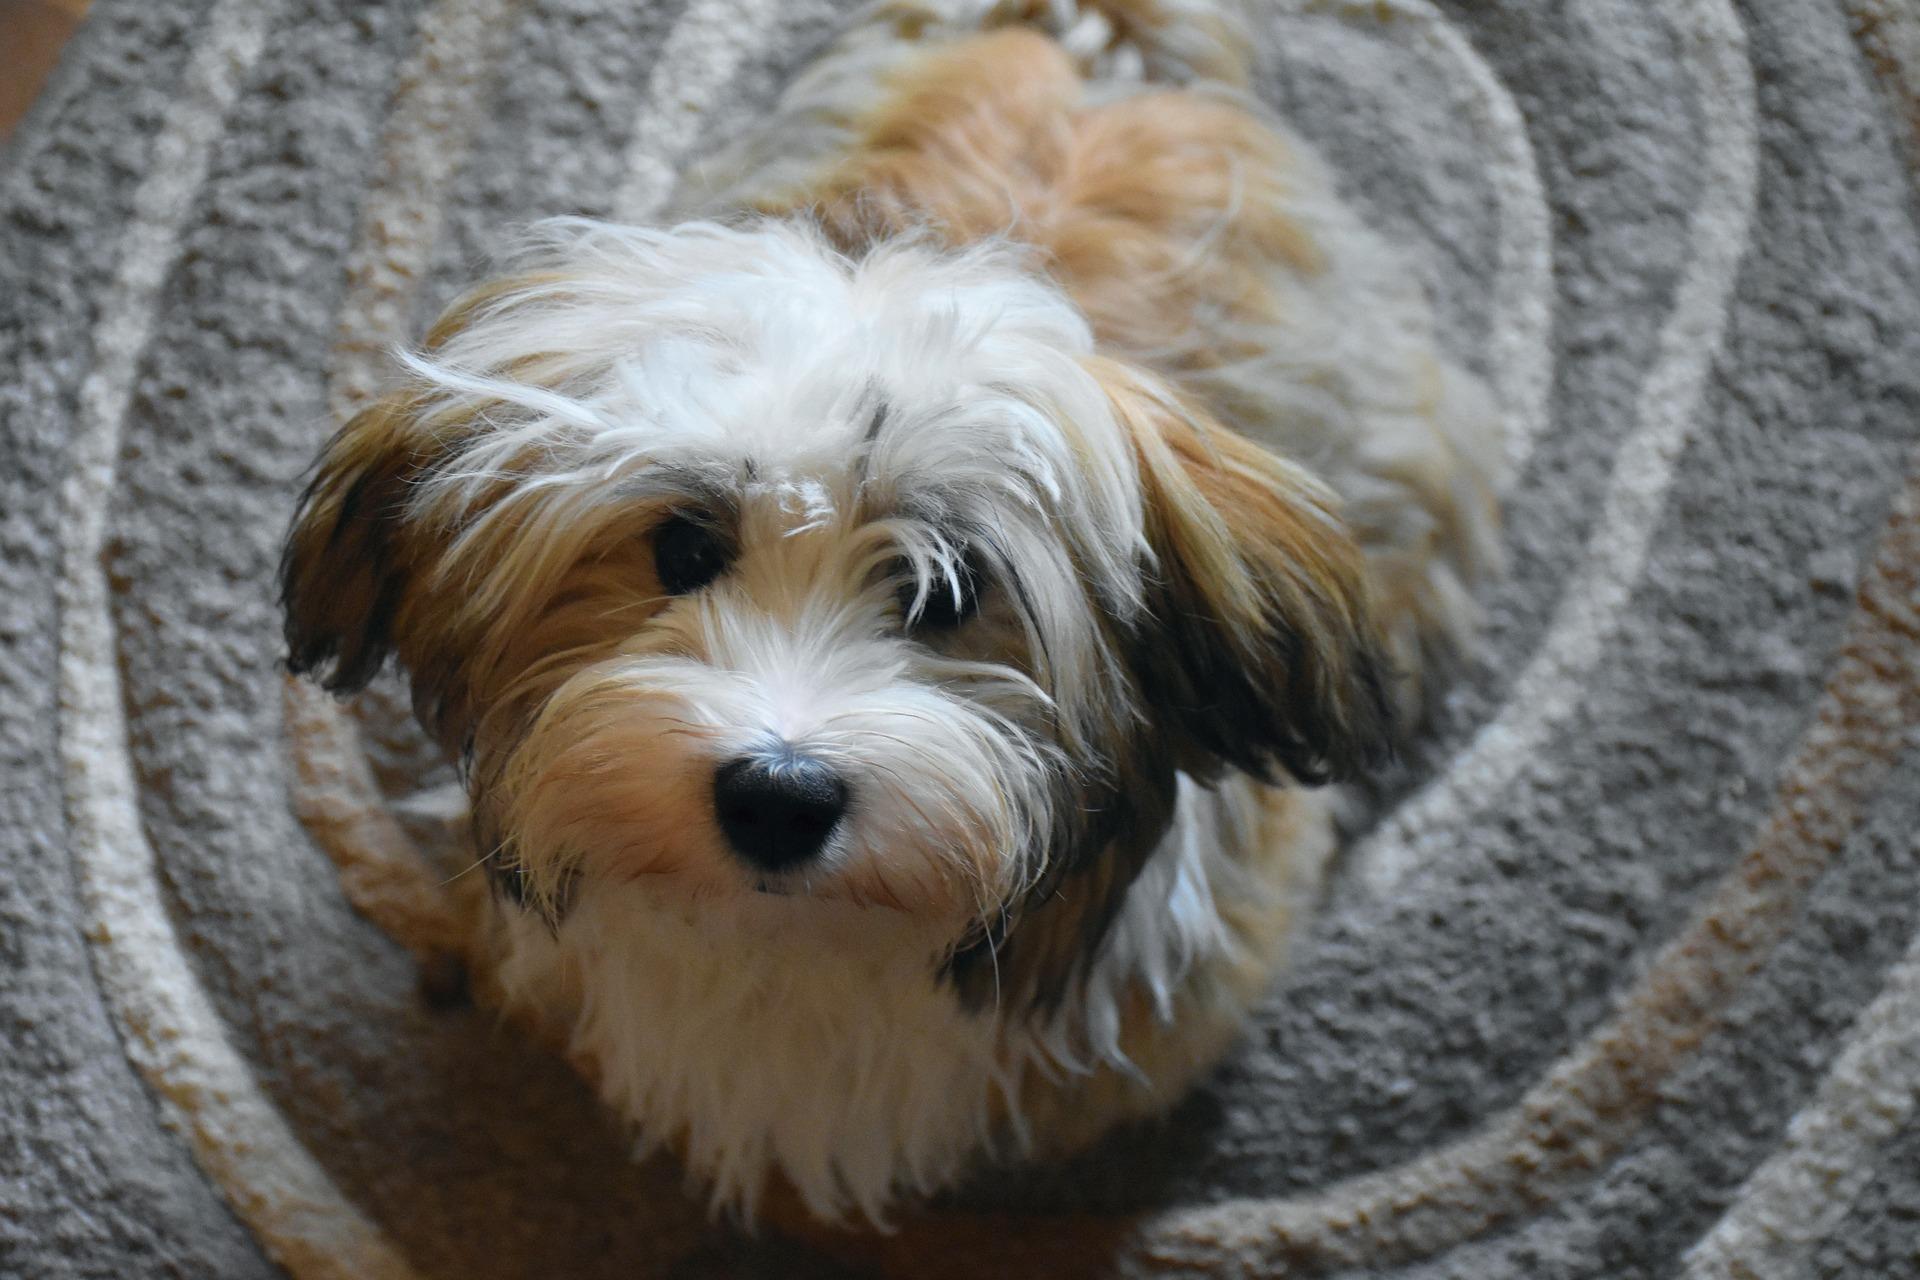 Picture of havanese dog.jpg